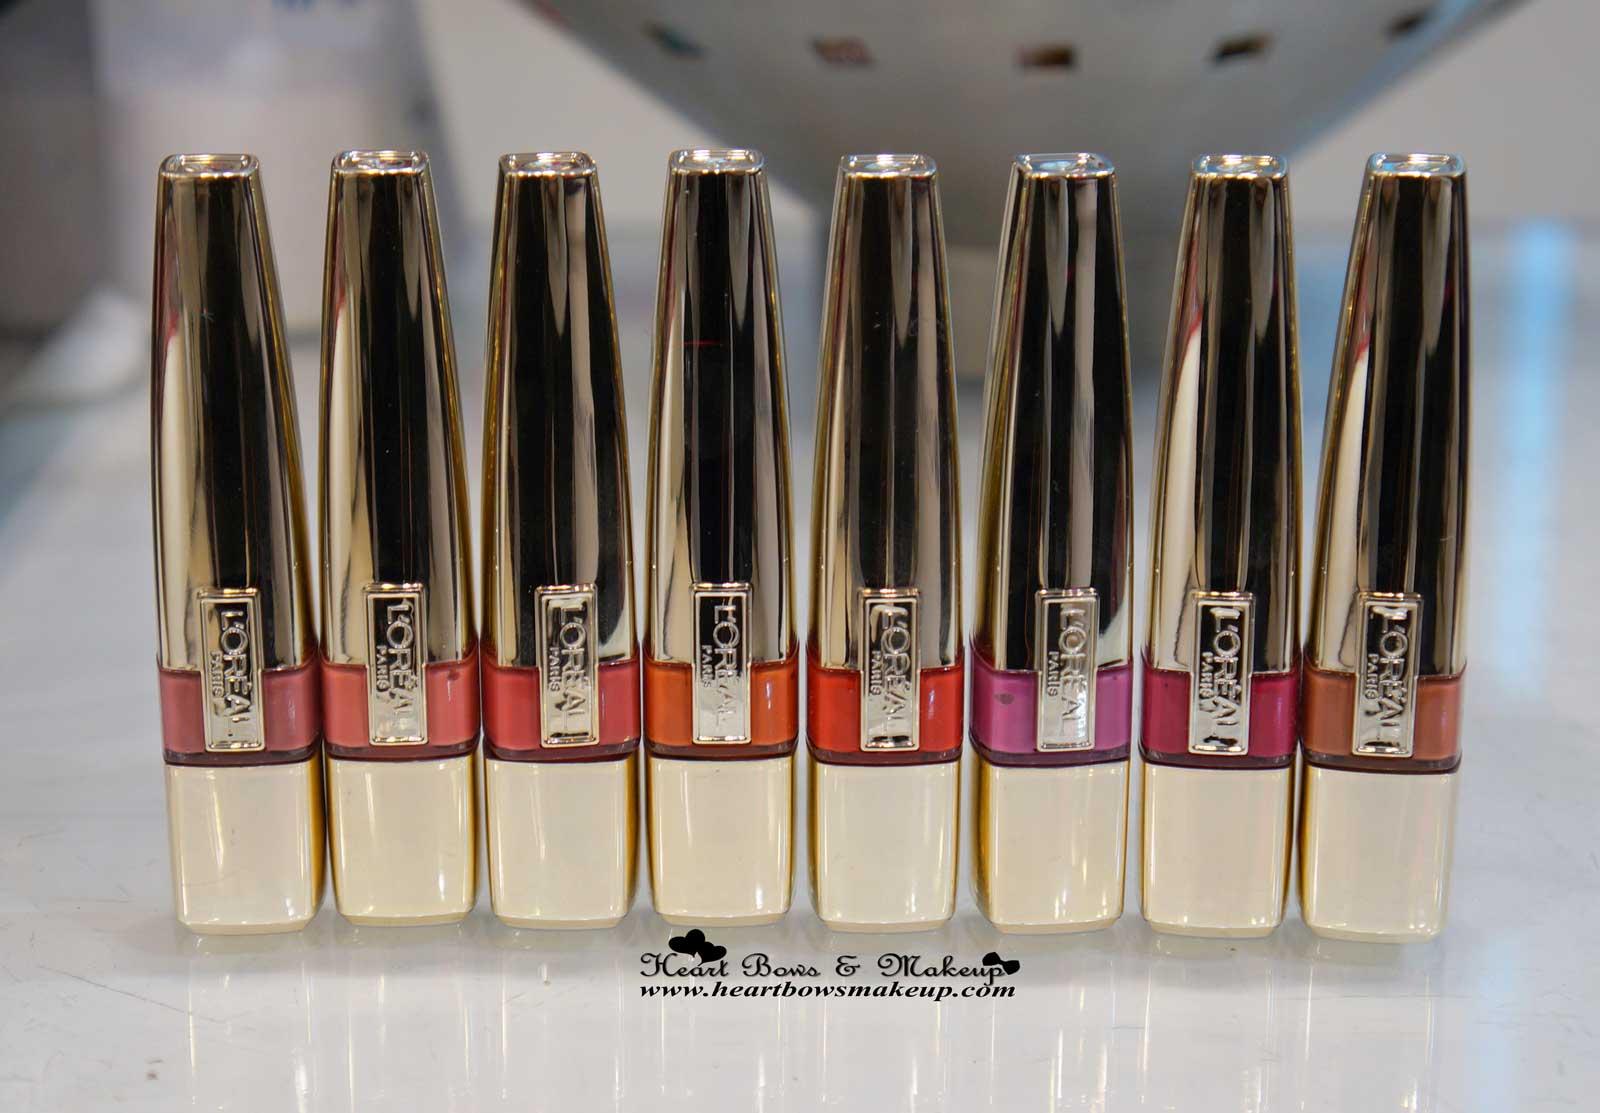 All L'oreal Caresse Shine Lip Colors Swatches Lolita Venus Bella Faye Juliette Milady Eve Pretty Woman